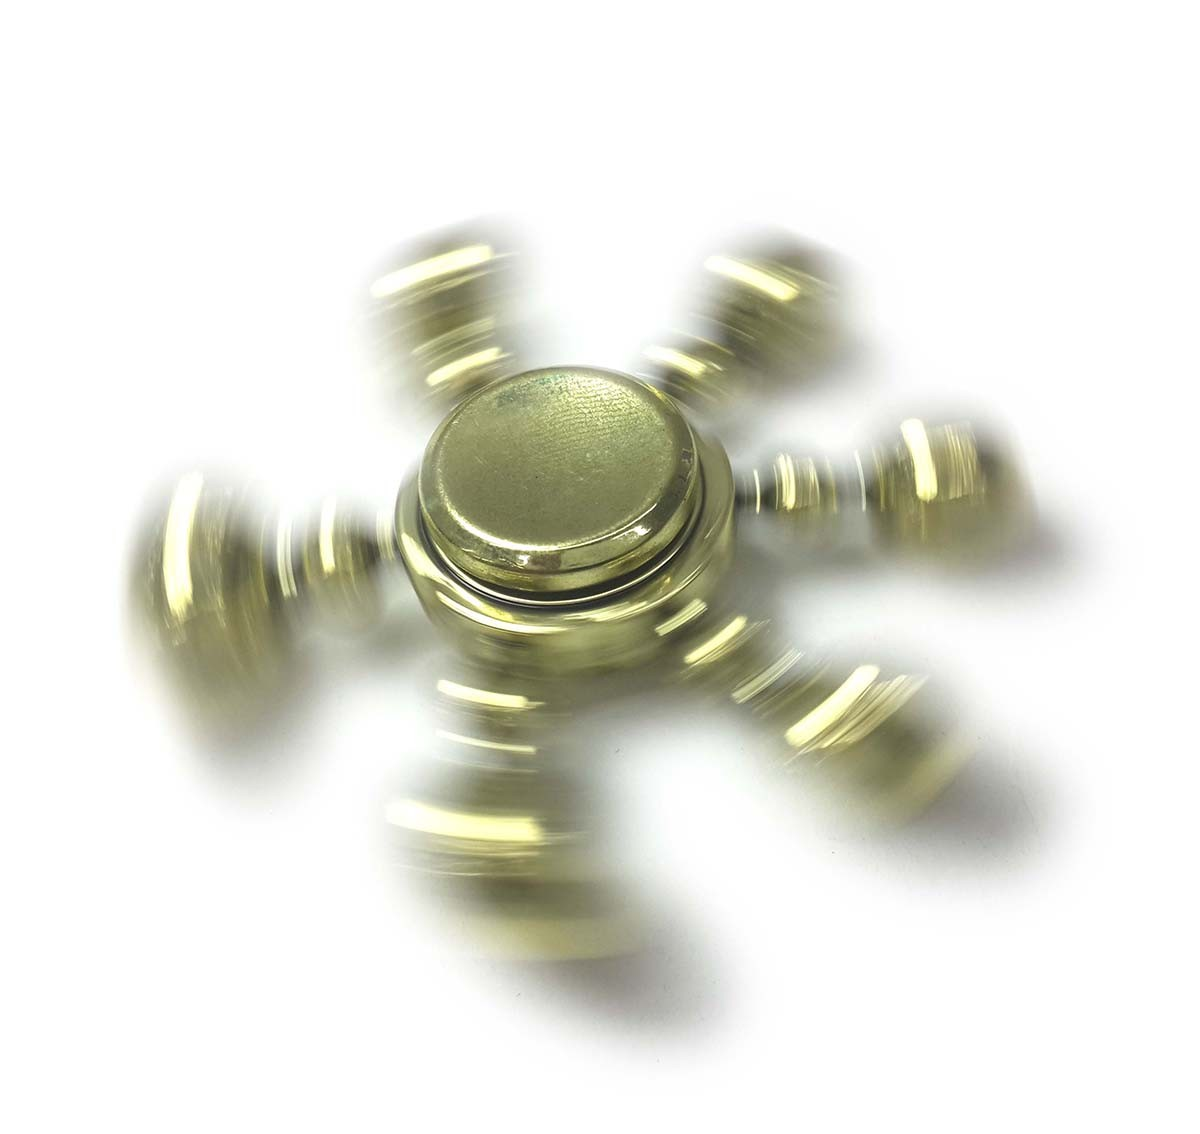 Hand Spinner Fidget De Metal Leme Dourado Mania Gira Ansiedade Anti Estresse (bsl-gira-10)